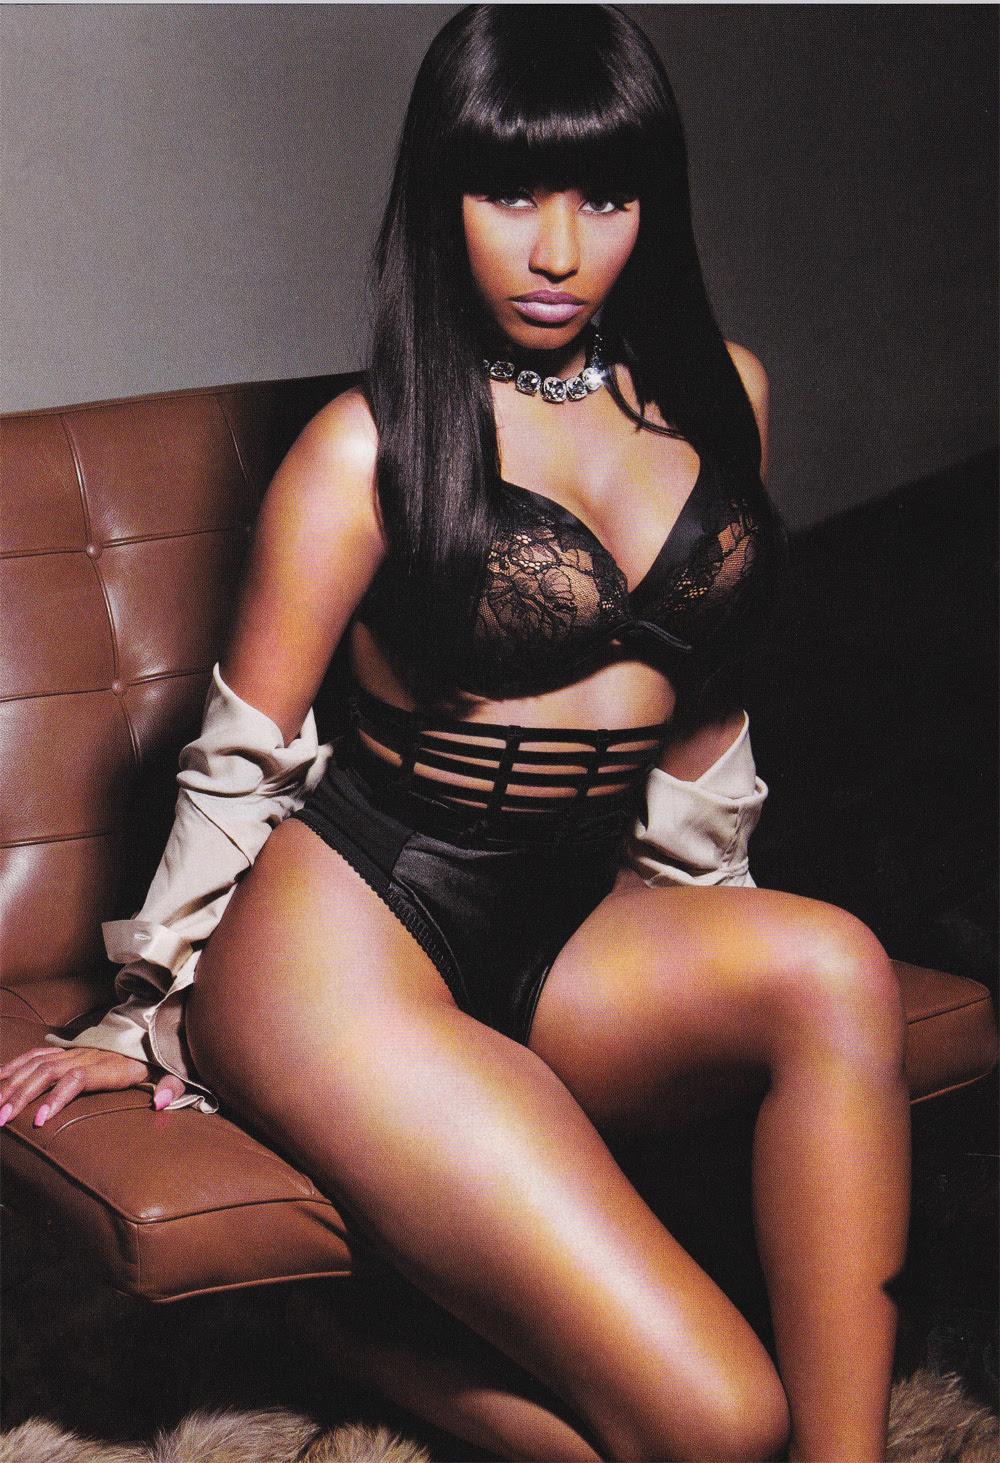 Flesh And Bones: Nicki Minaj Booty